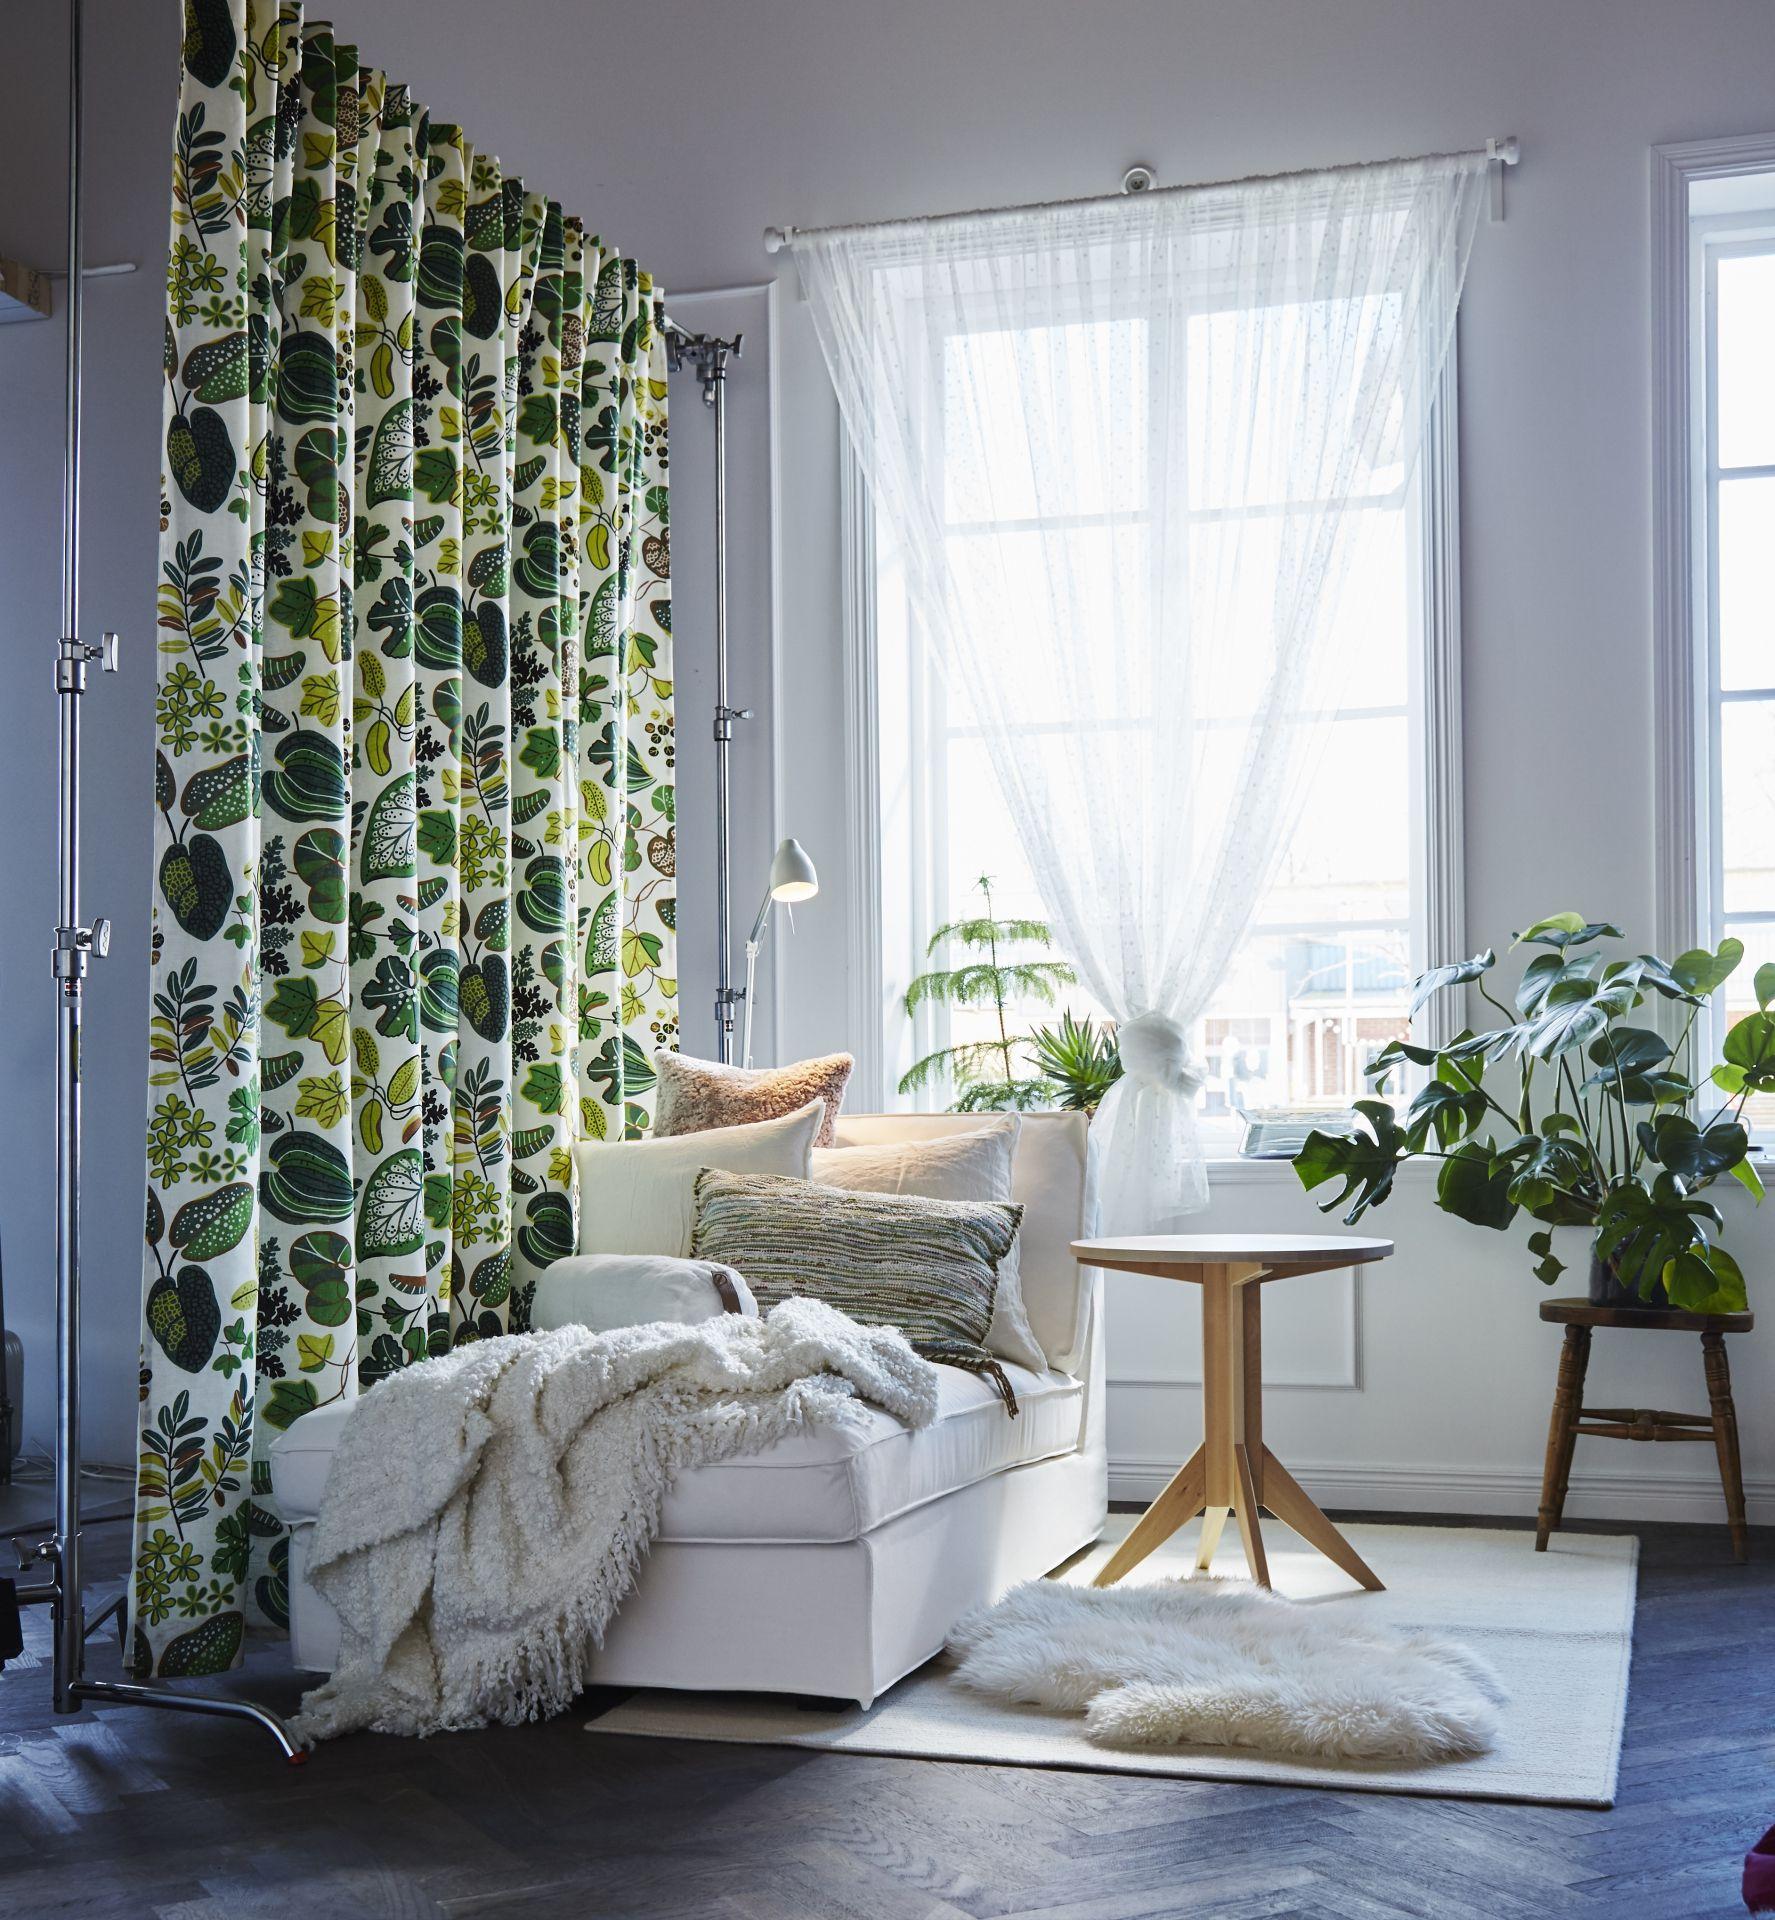 SYSSAN gordijnen  IKEA IKEAnl inspiratie woonkamer